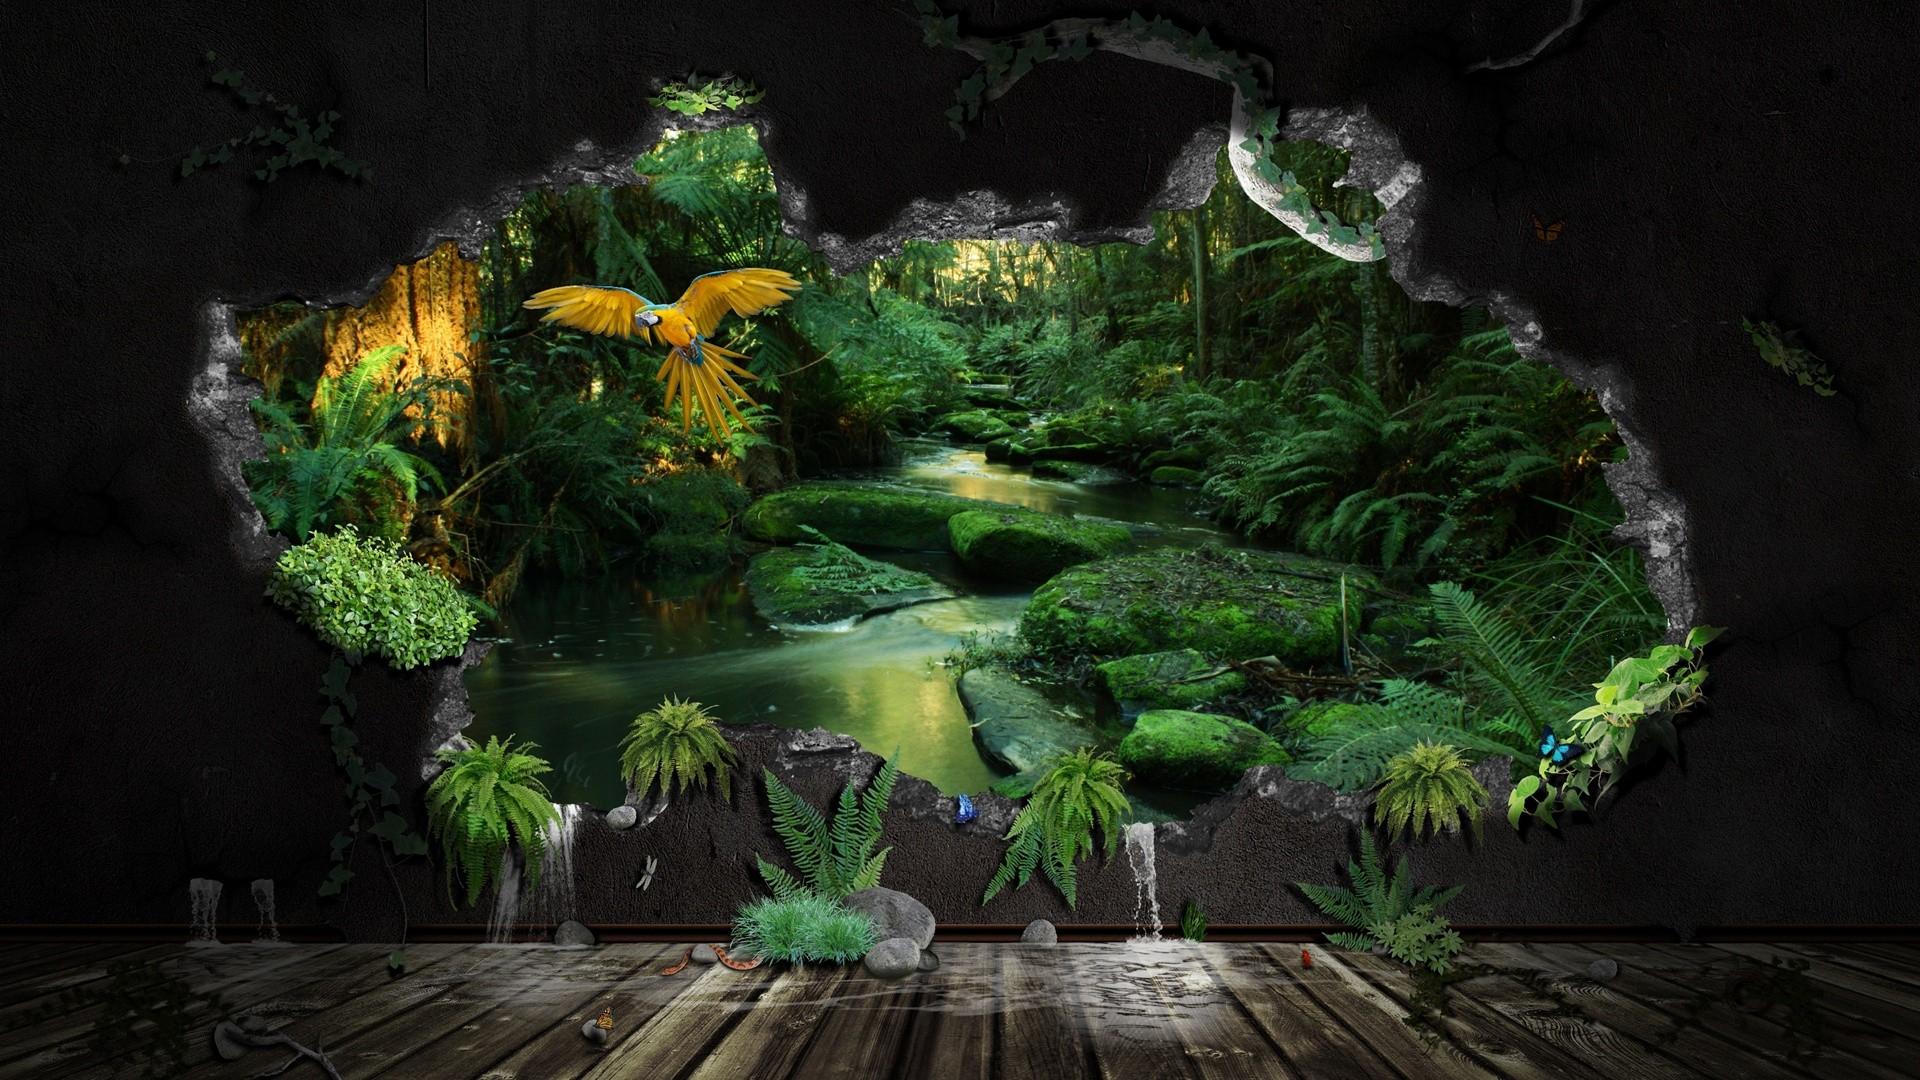 Jungle wallpaper for home wallpapersafari for 80s wallpaper home